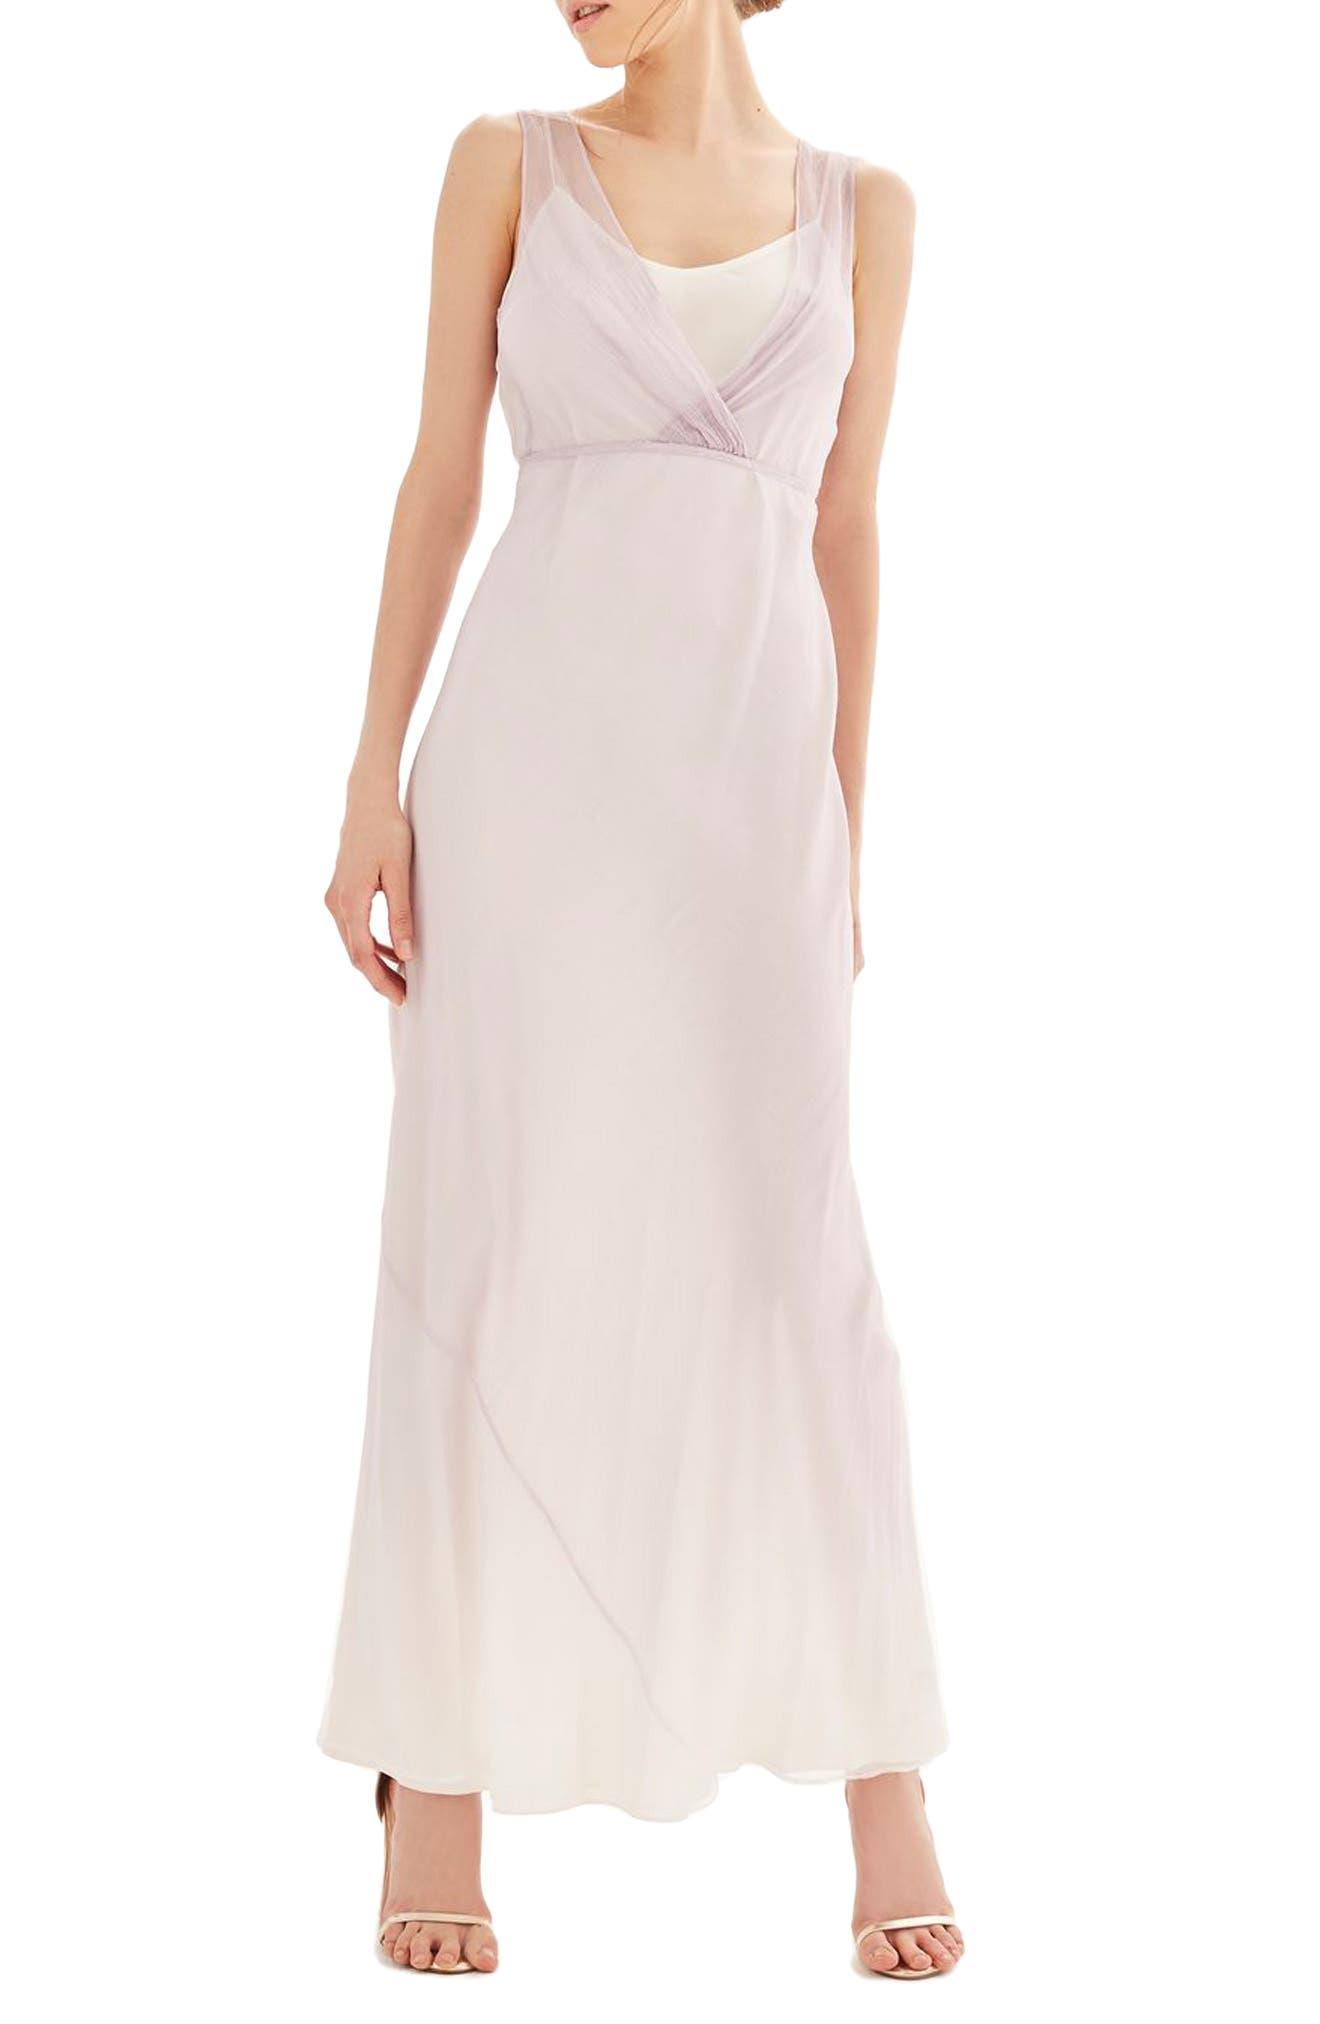 Topshop Bride Column Gown